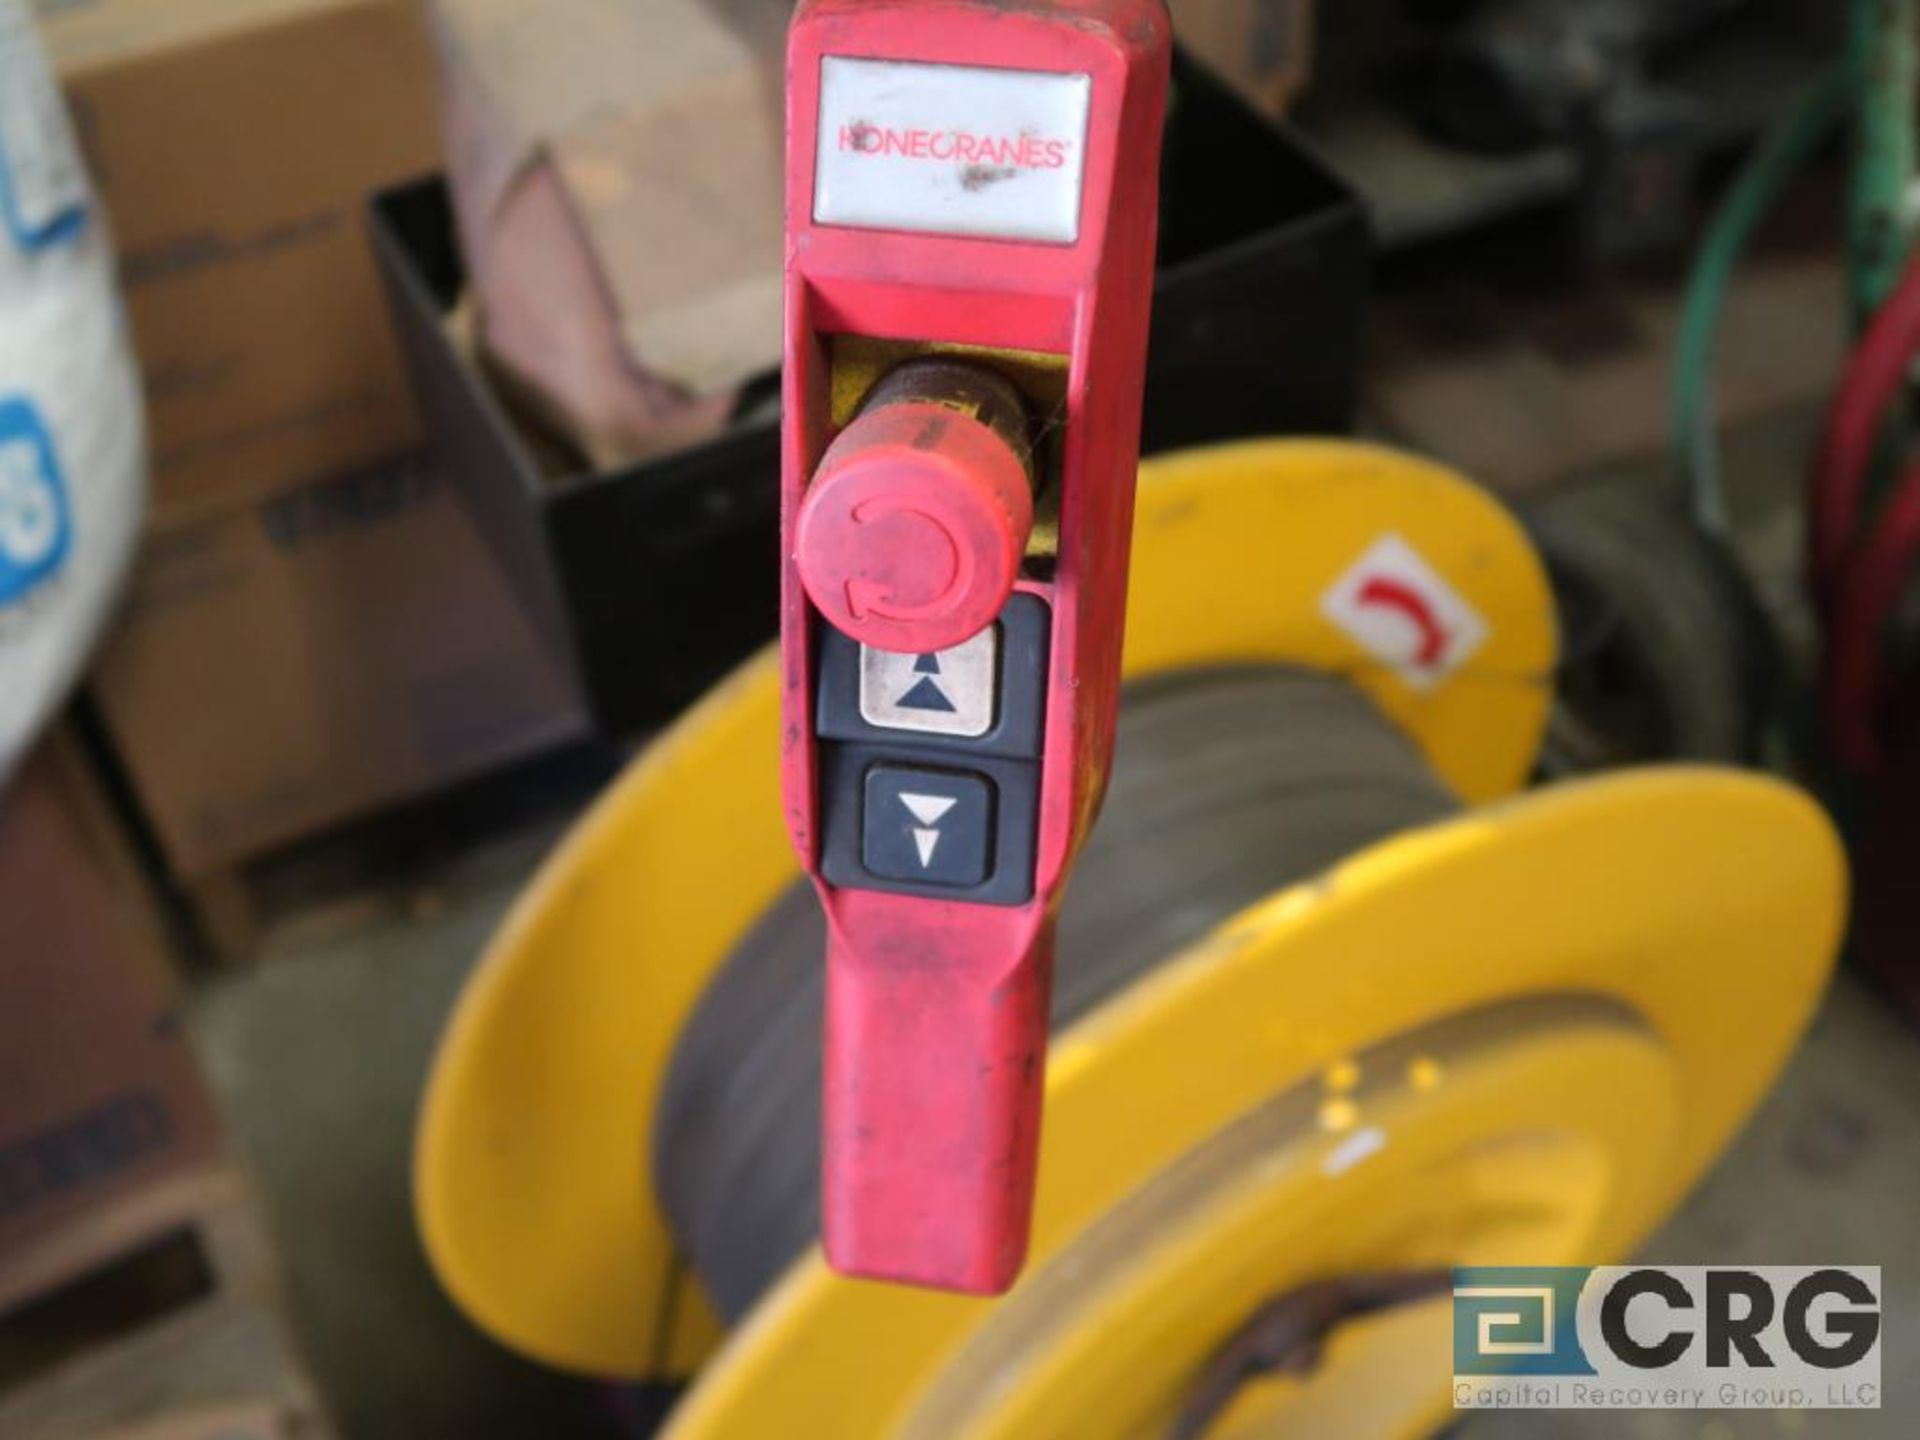 Electric chain hoist, 1 ton cap.-no rail (Stores Area) - Image 4 of 4